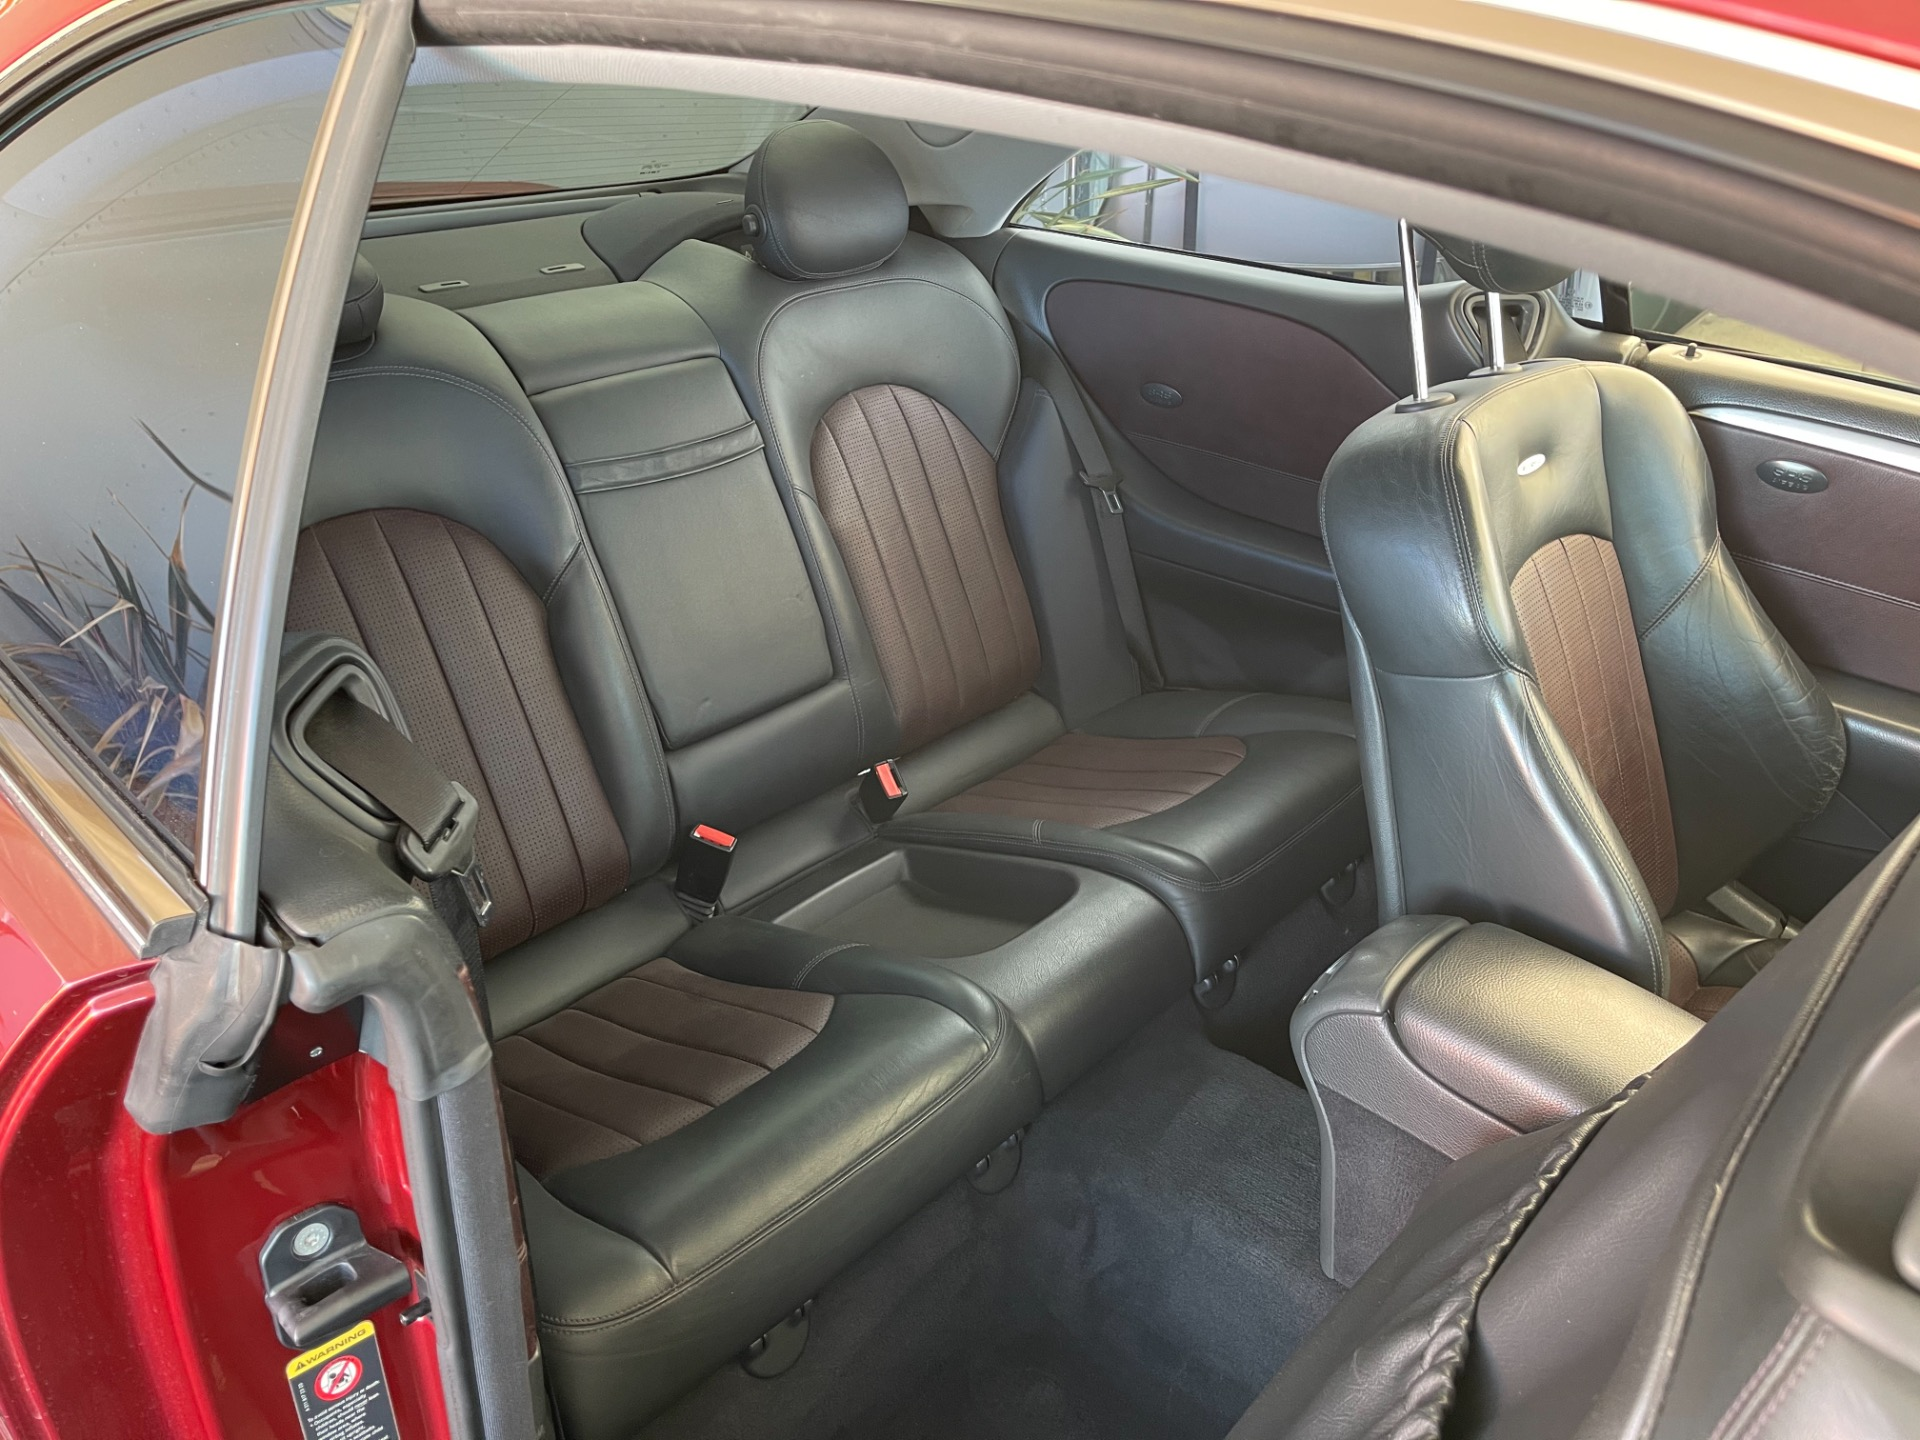 Used 2003 Mercedes Benz CLK 55 AMG